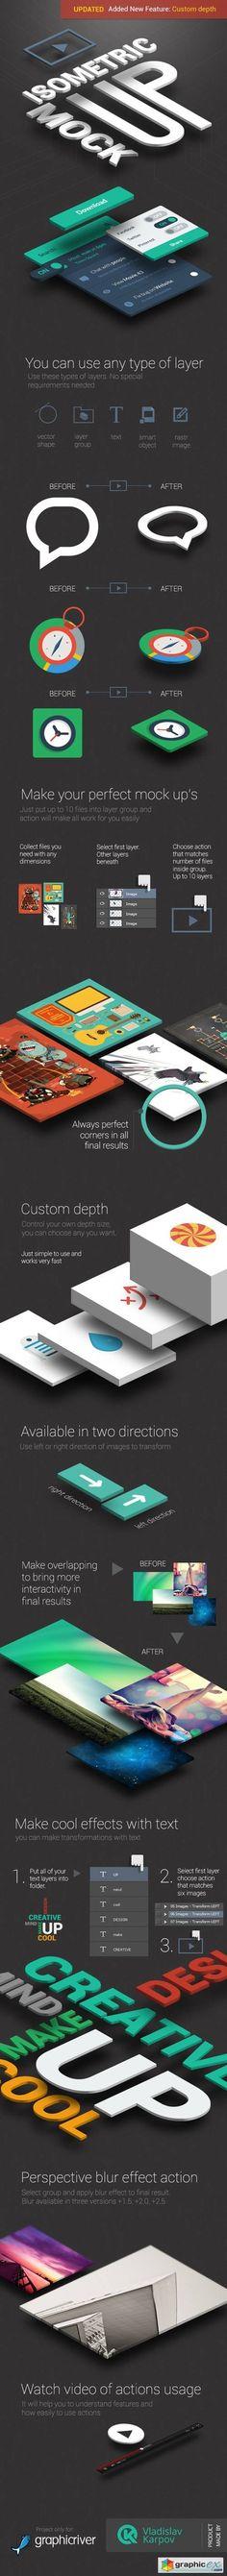 #Isometric #App #MockUp Actions Bundle